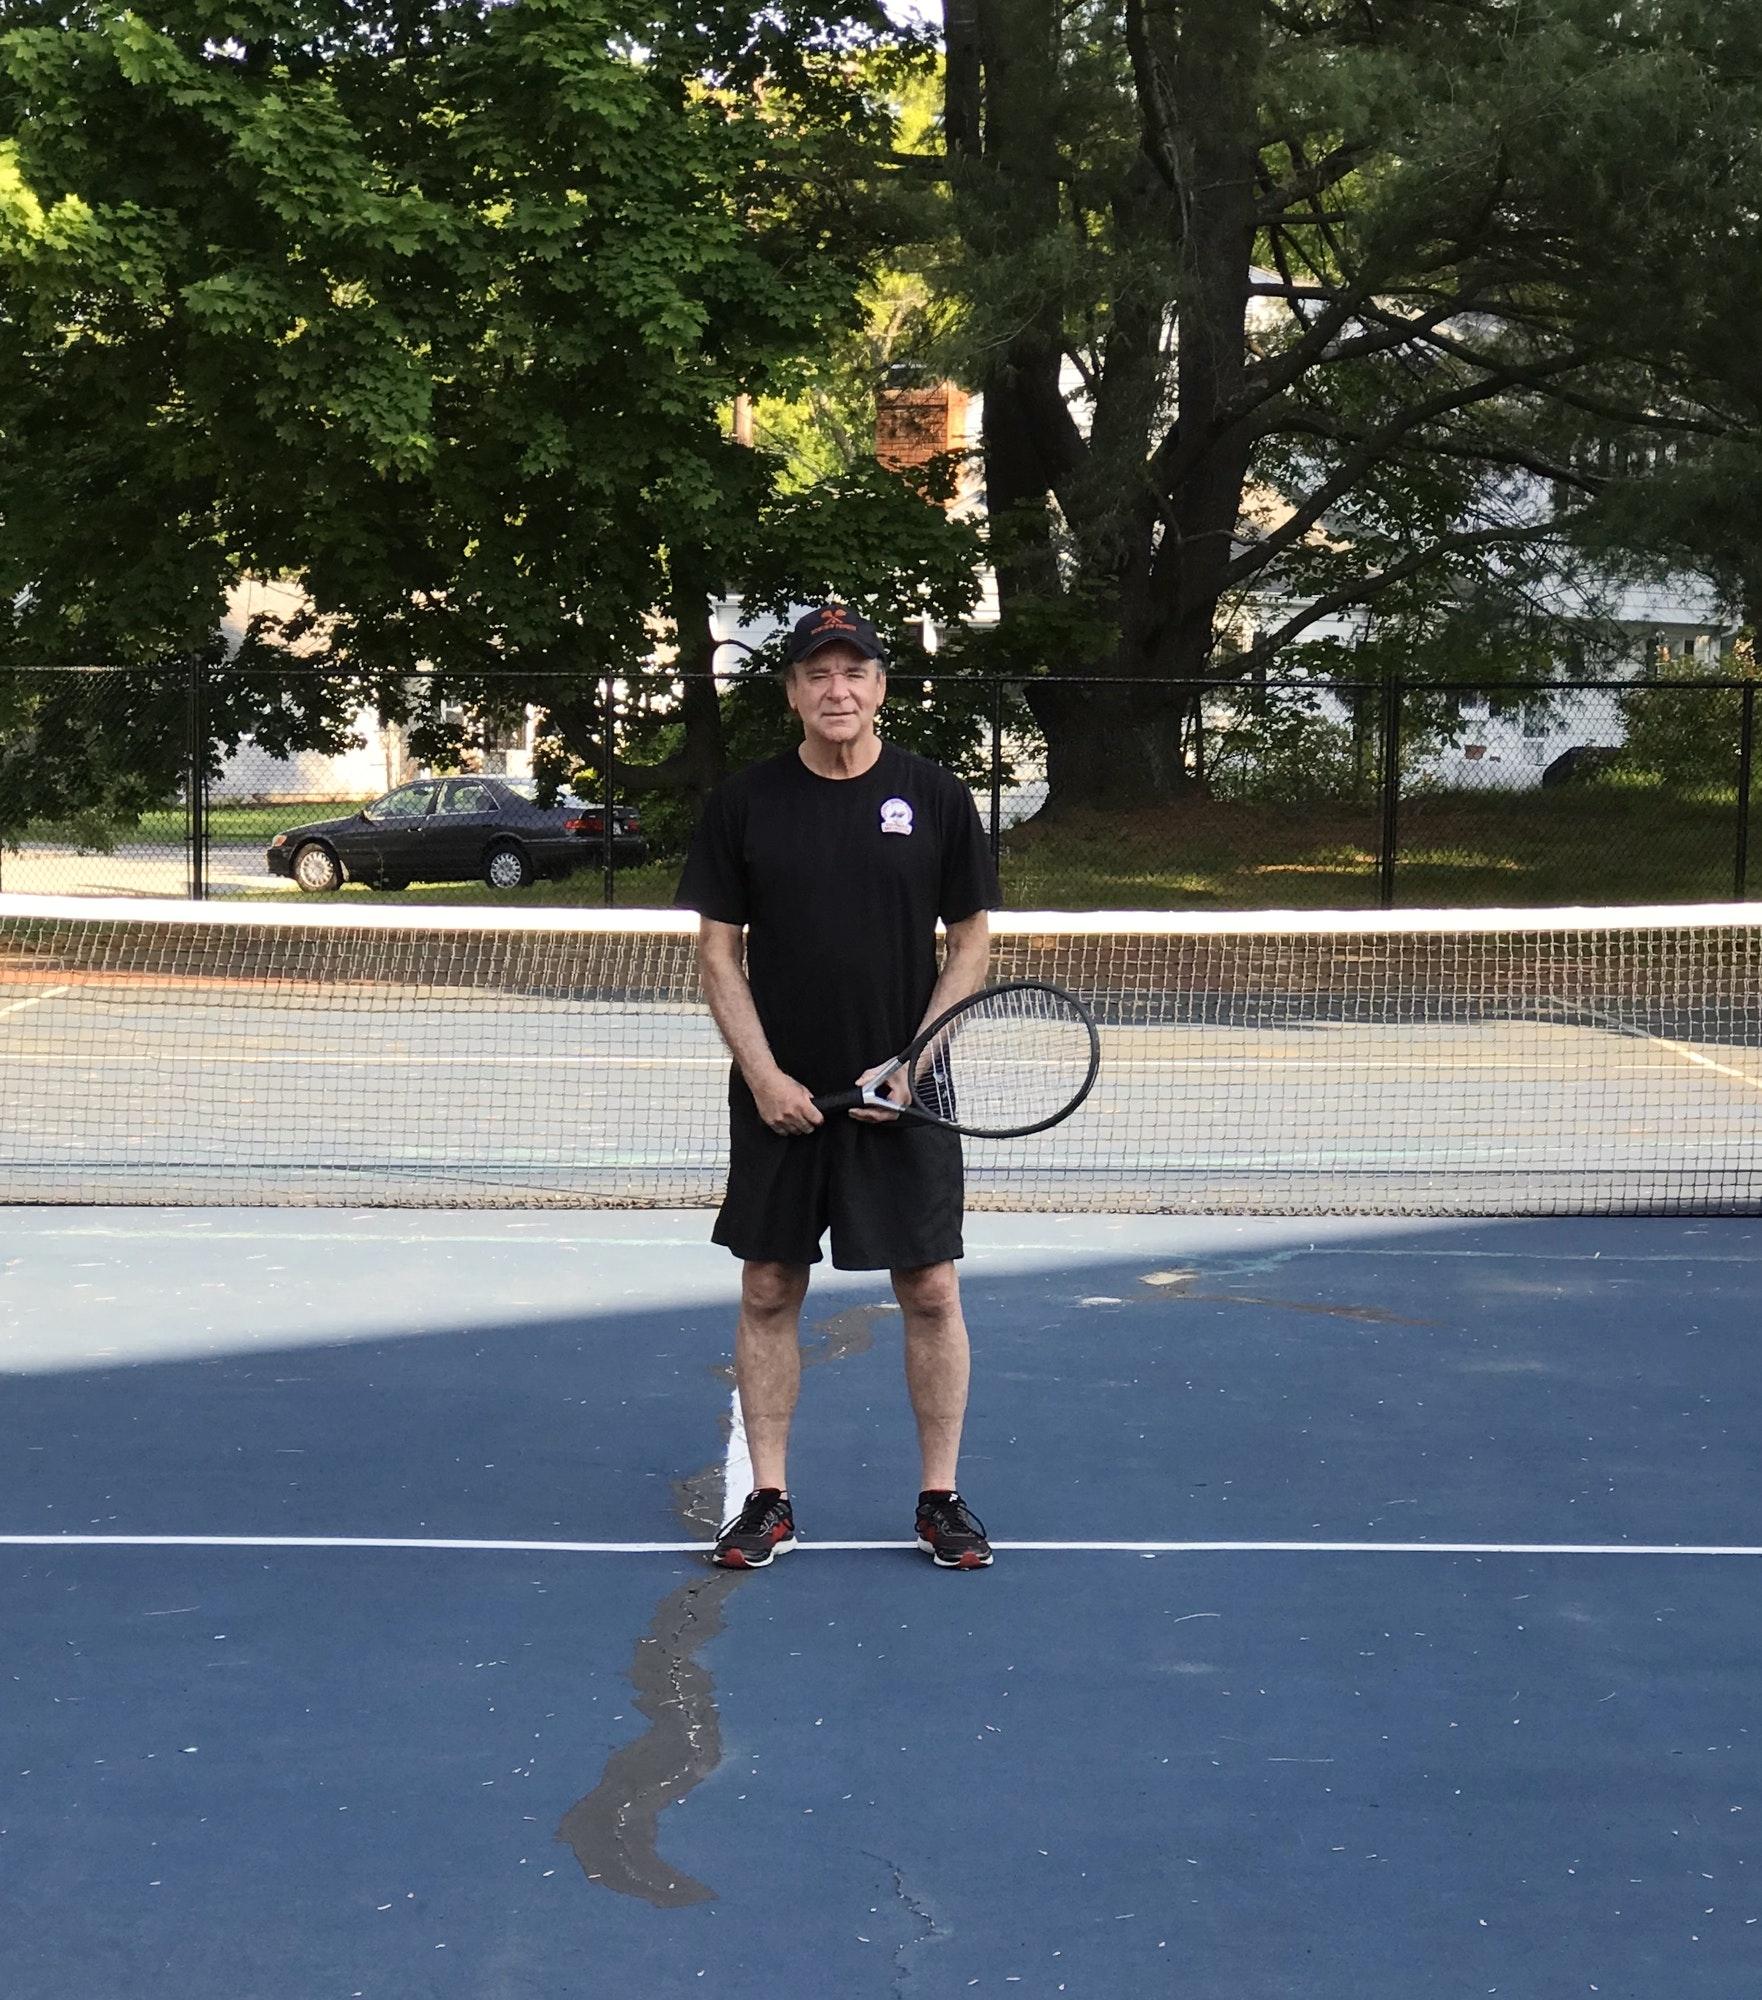 John J. teaches tennis lessons in Woburn, MA